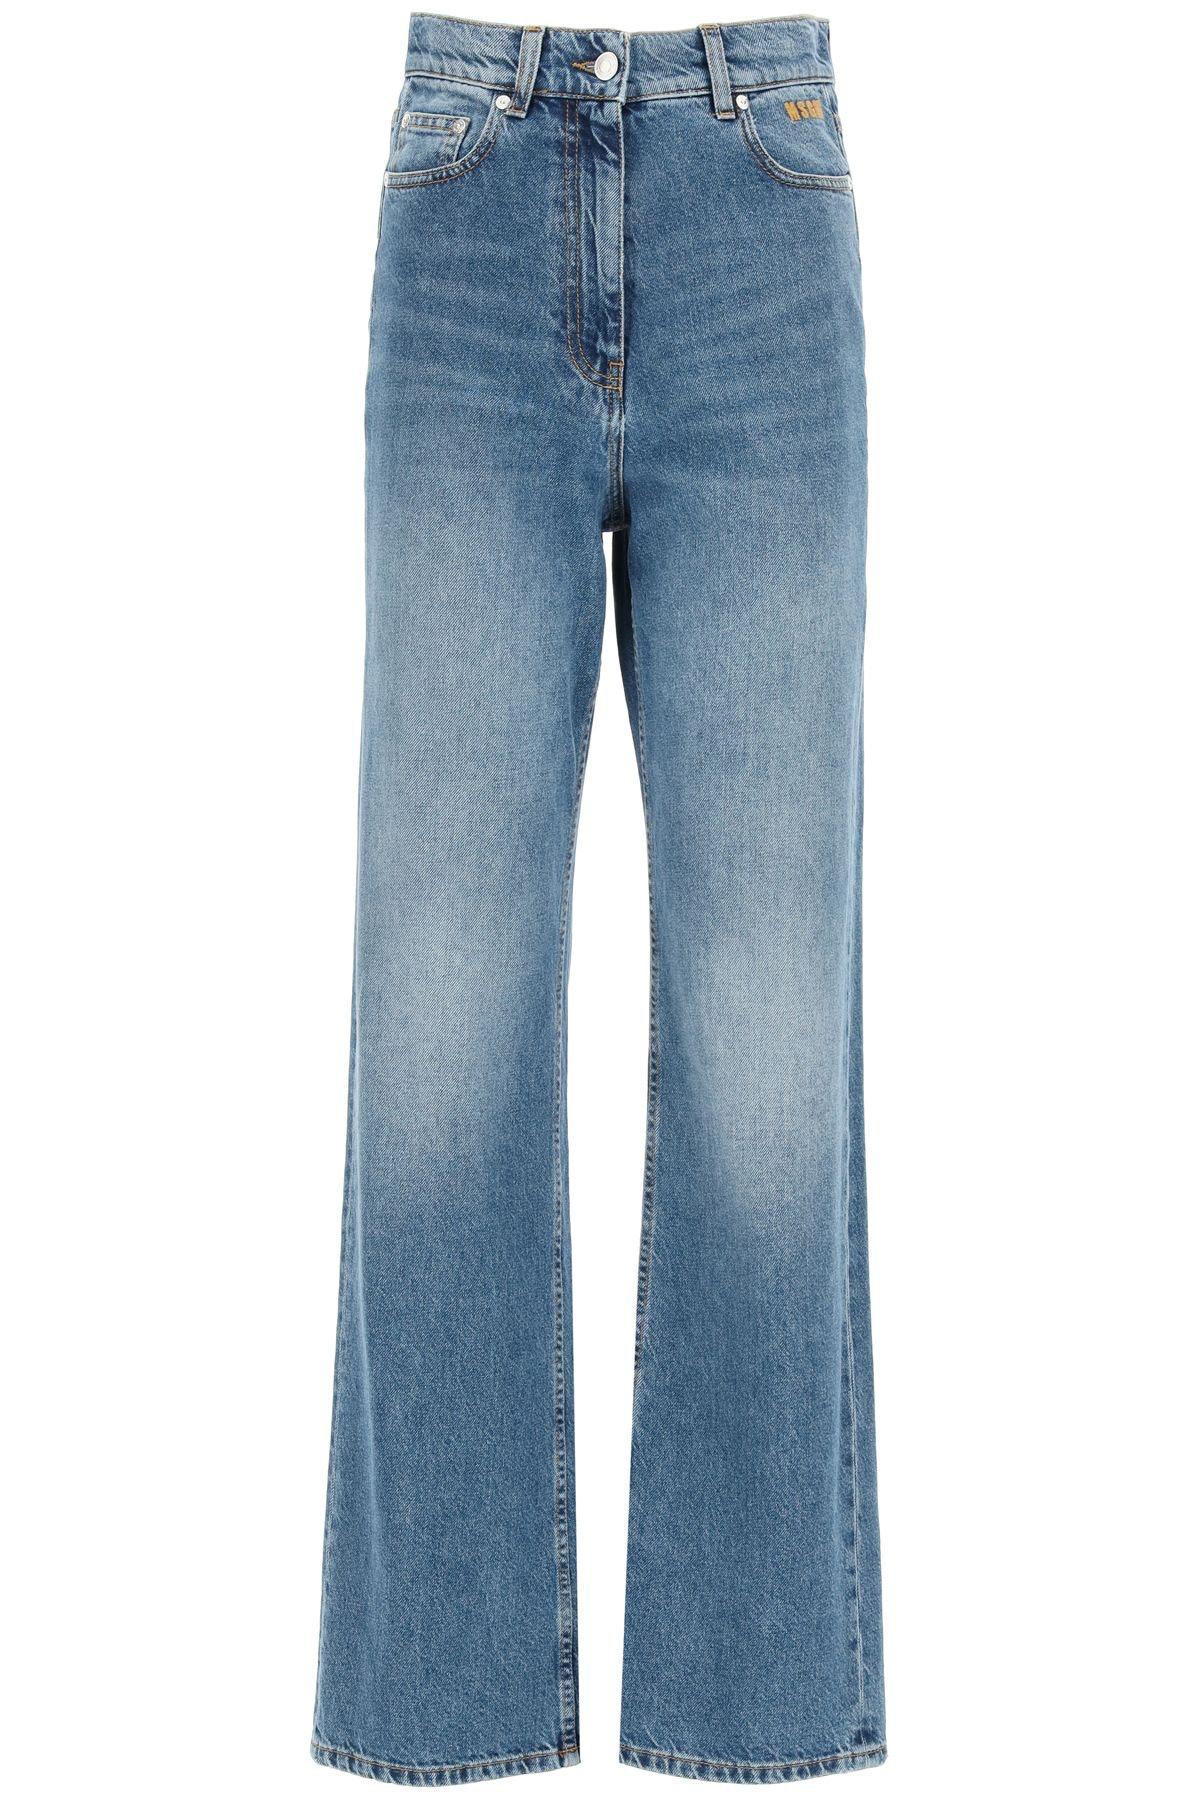 Msgm Oversize Jeans: image 1